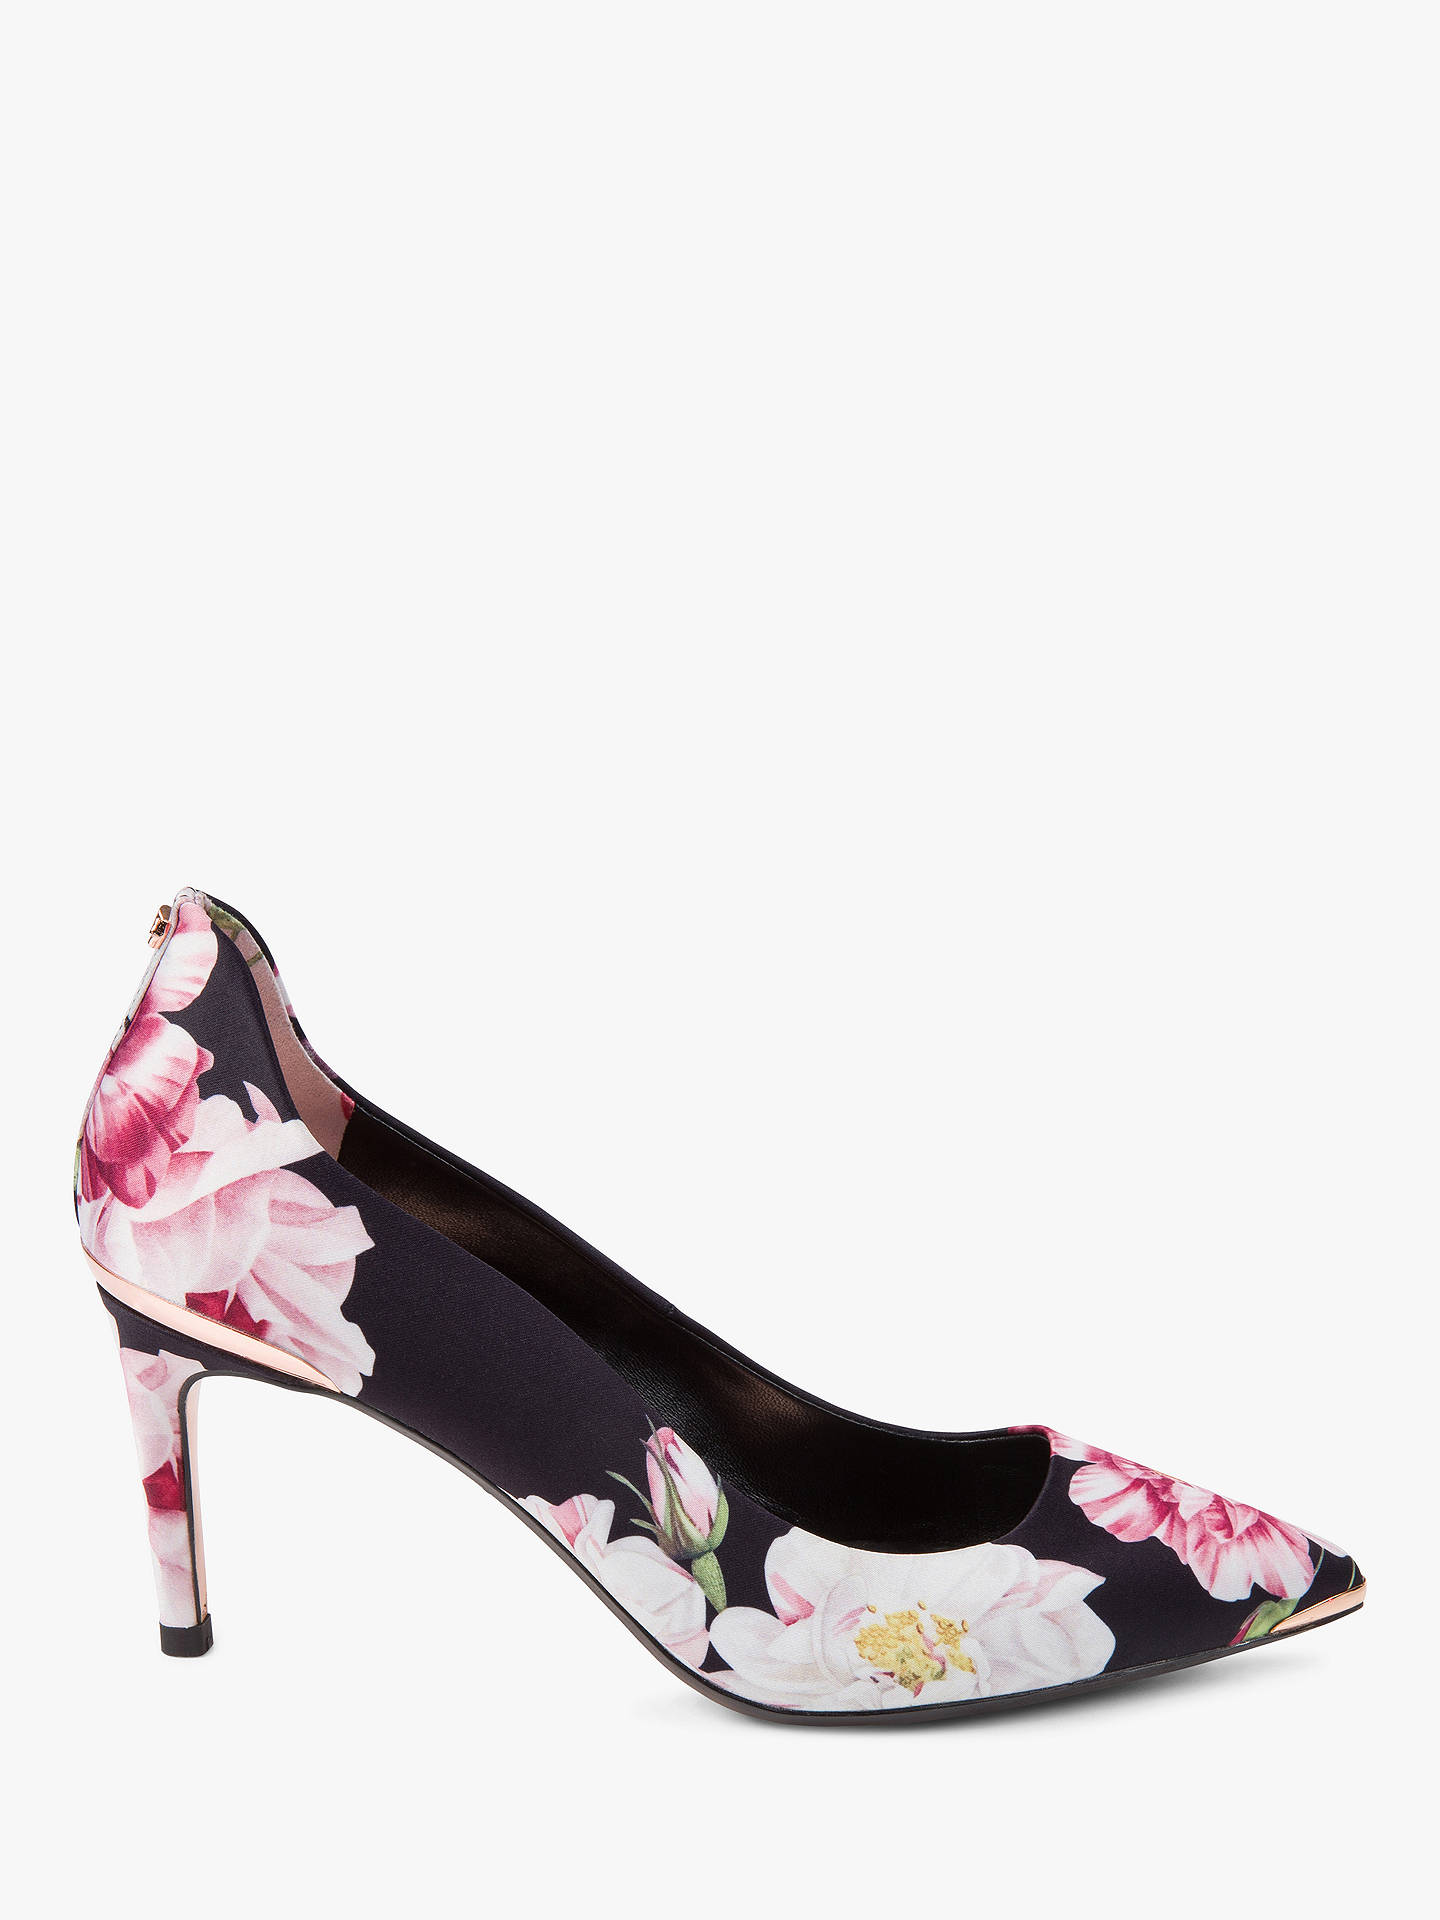 6faf87b752808f Buy Ted Baker Viyxinp Stiletto Heel Court Shoes